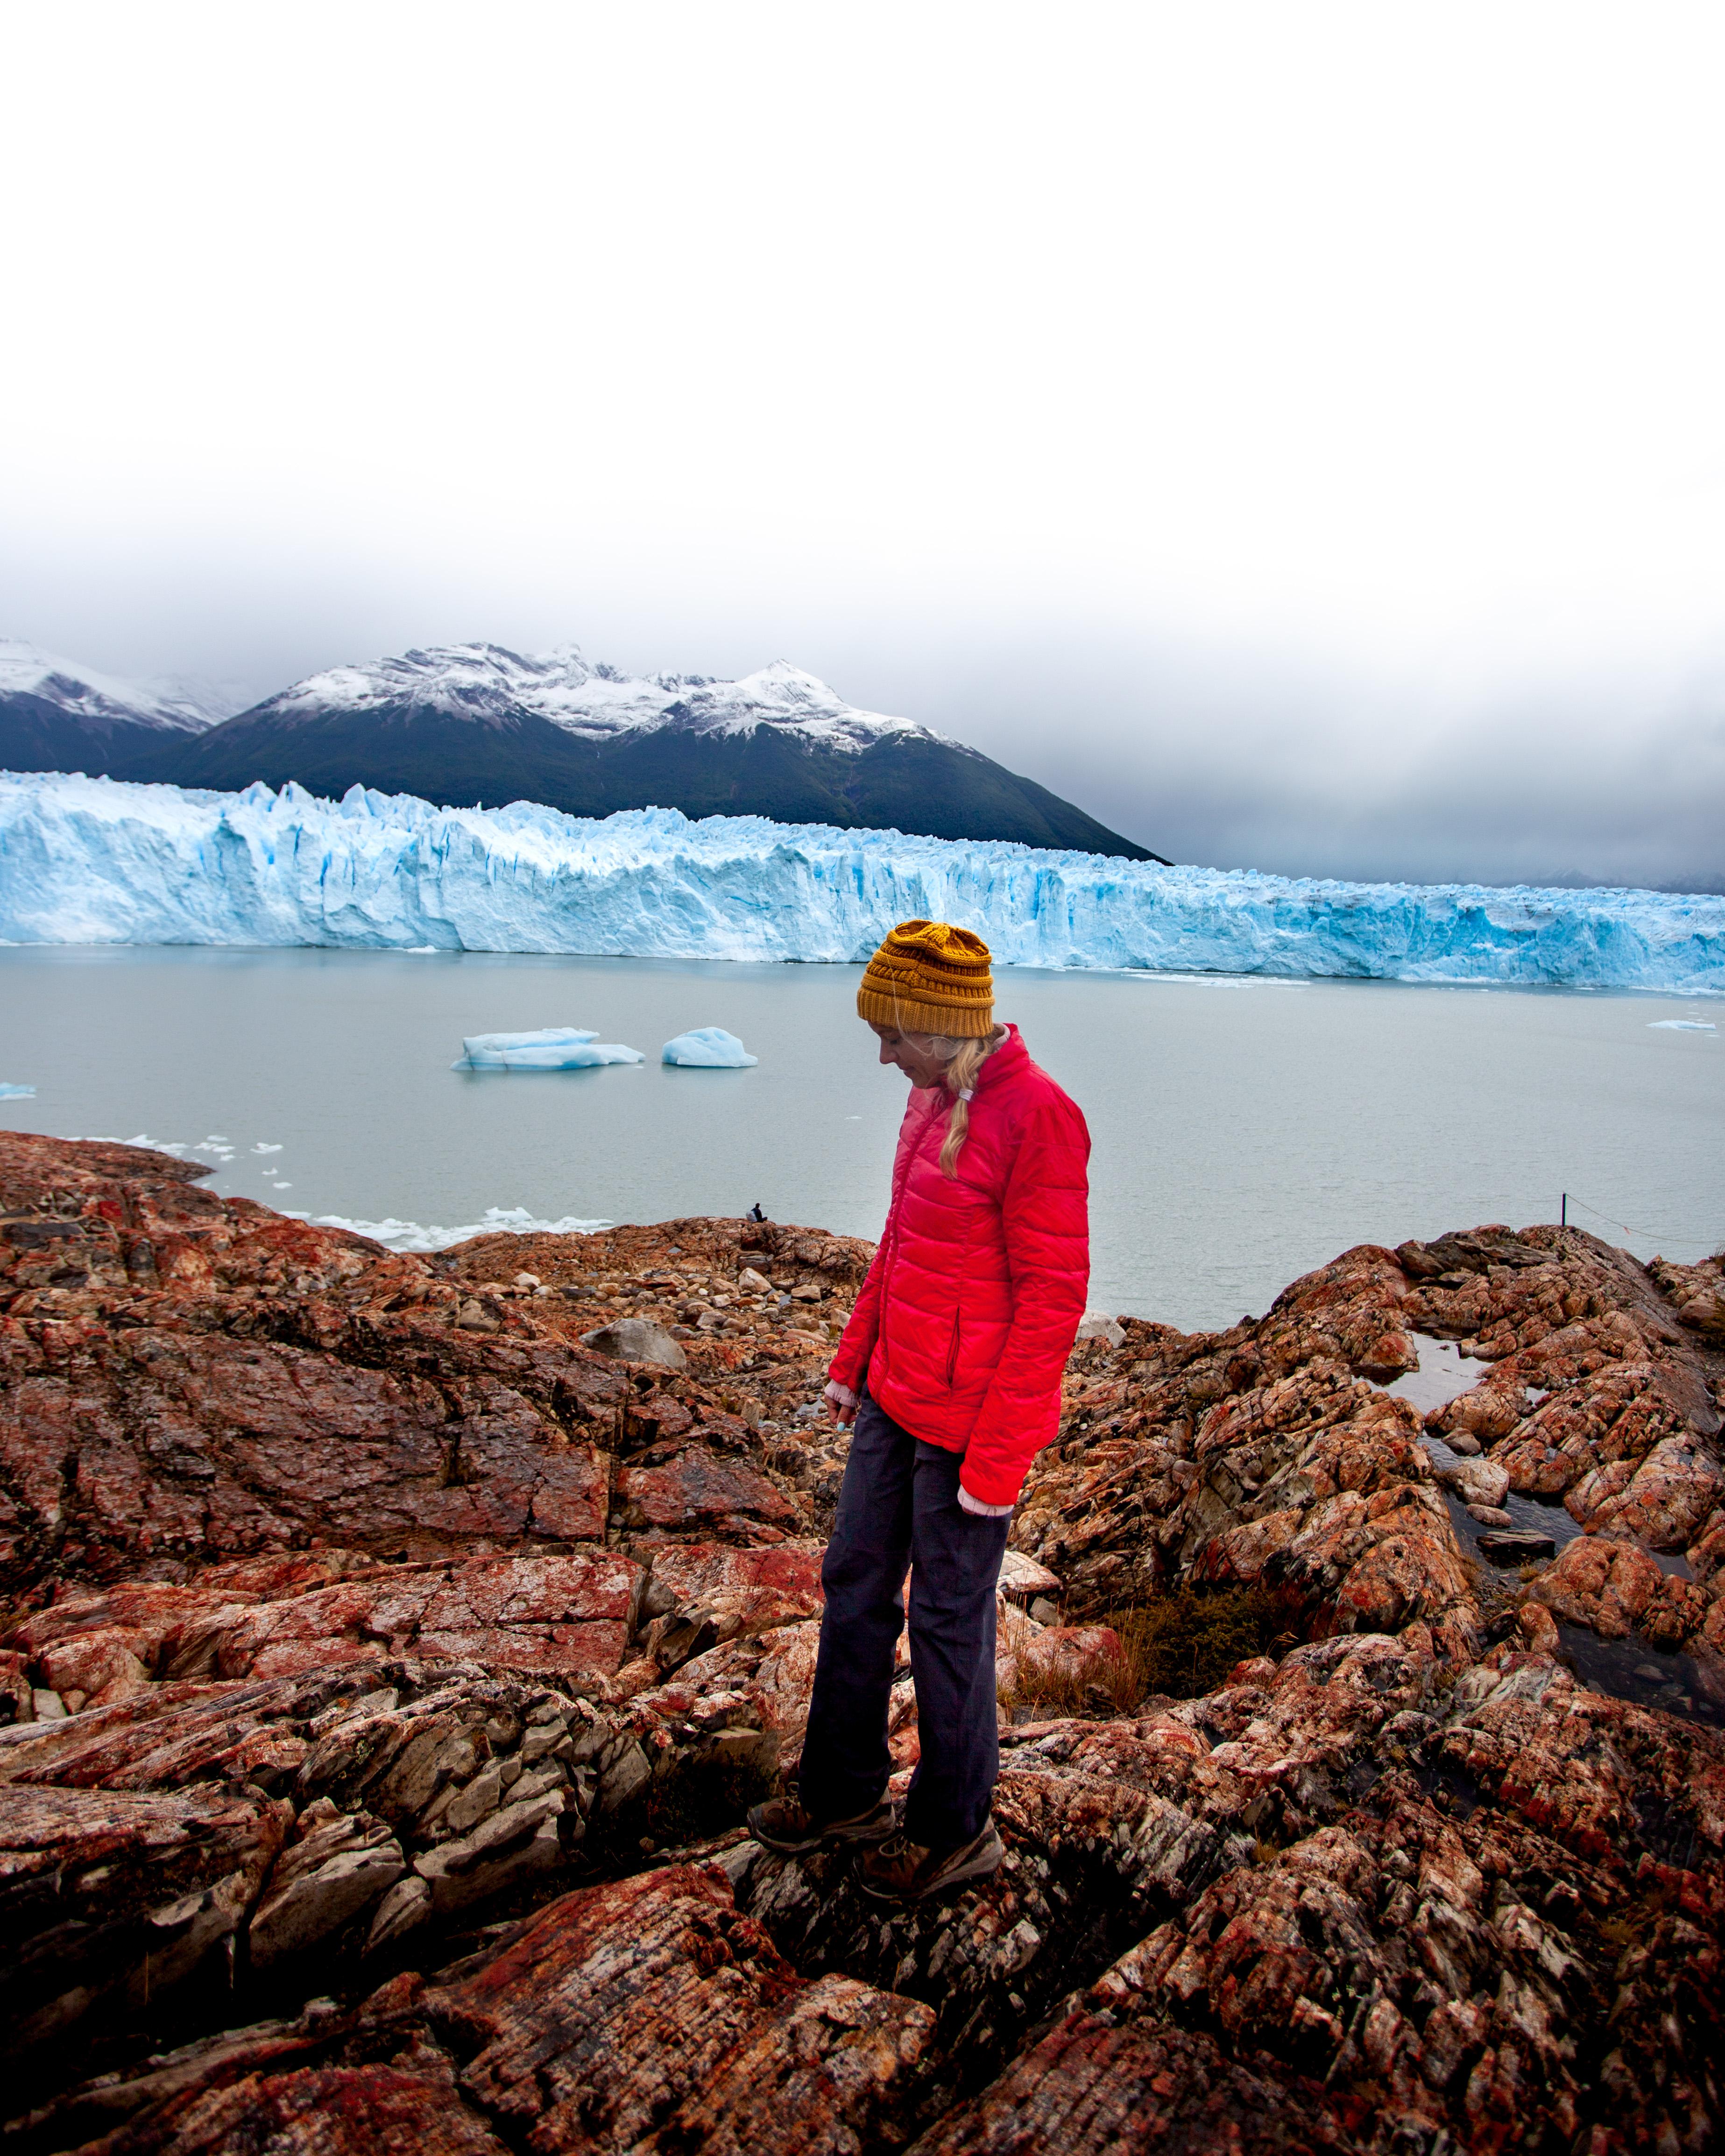 Girl walking in front of the Perito Moreno Glacier